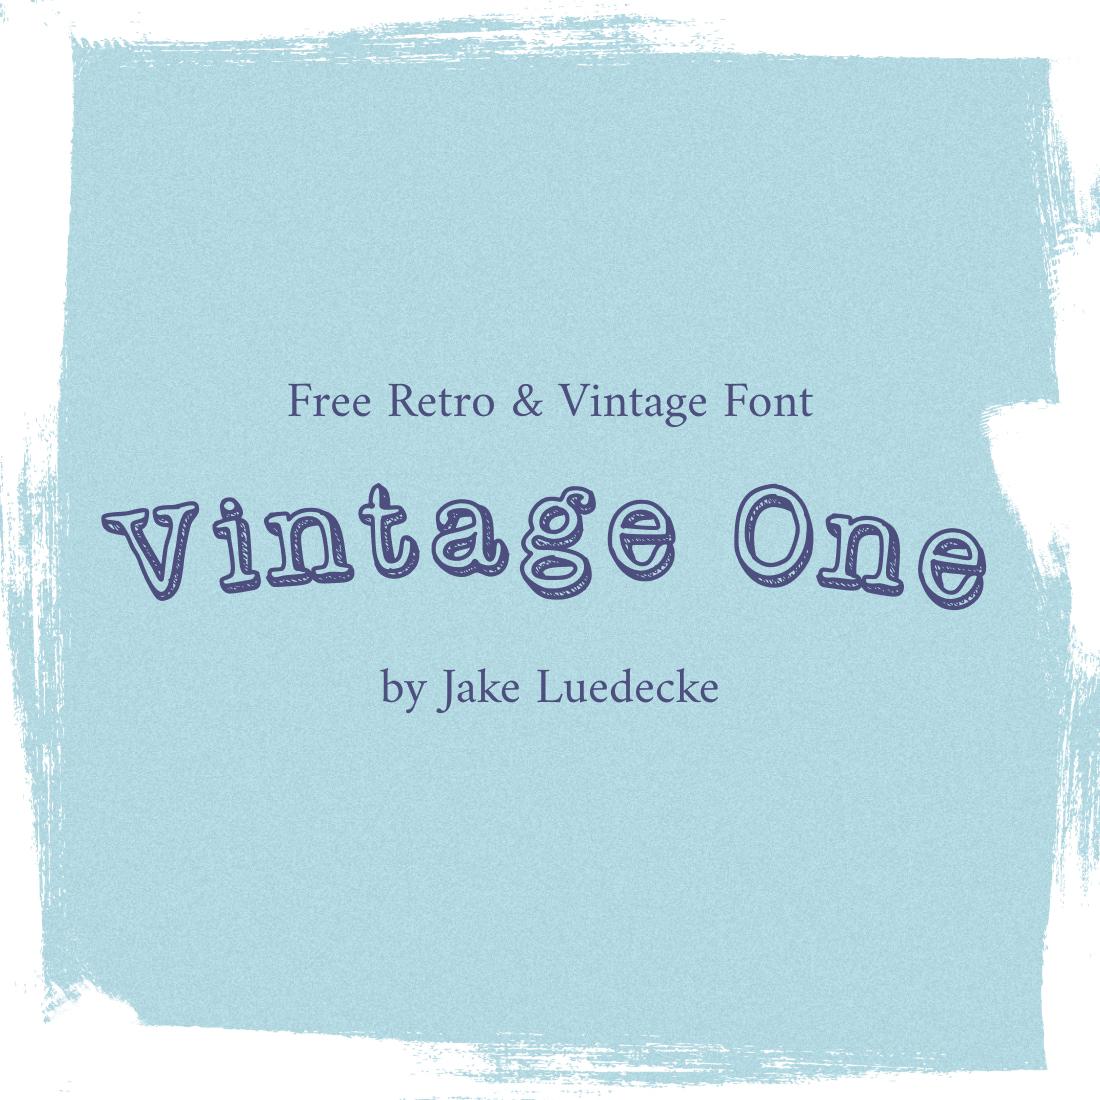 01 Free Retro vintage Font 1100x1100 1